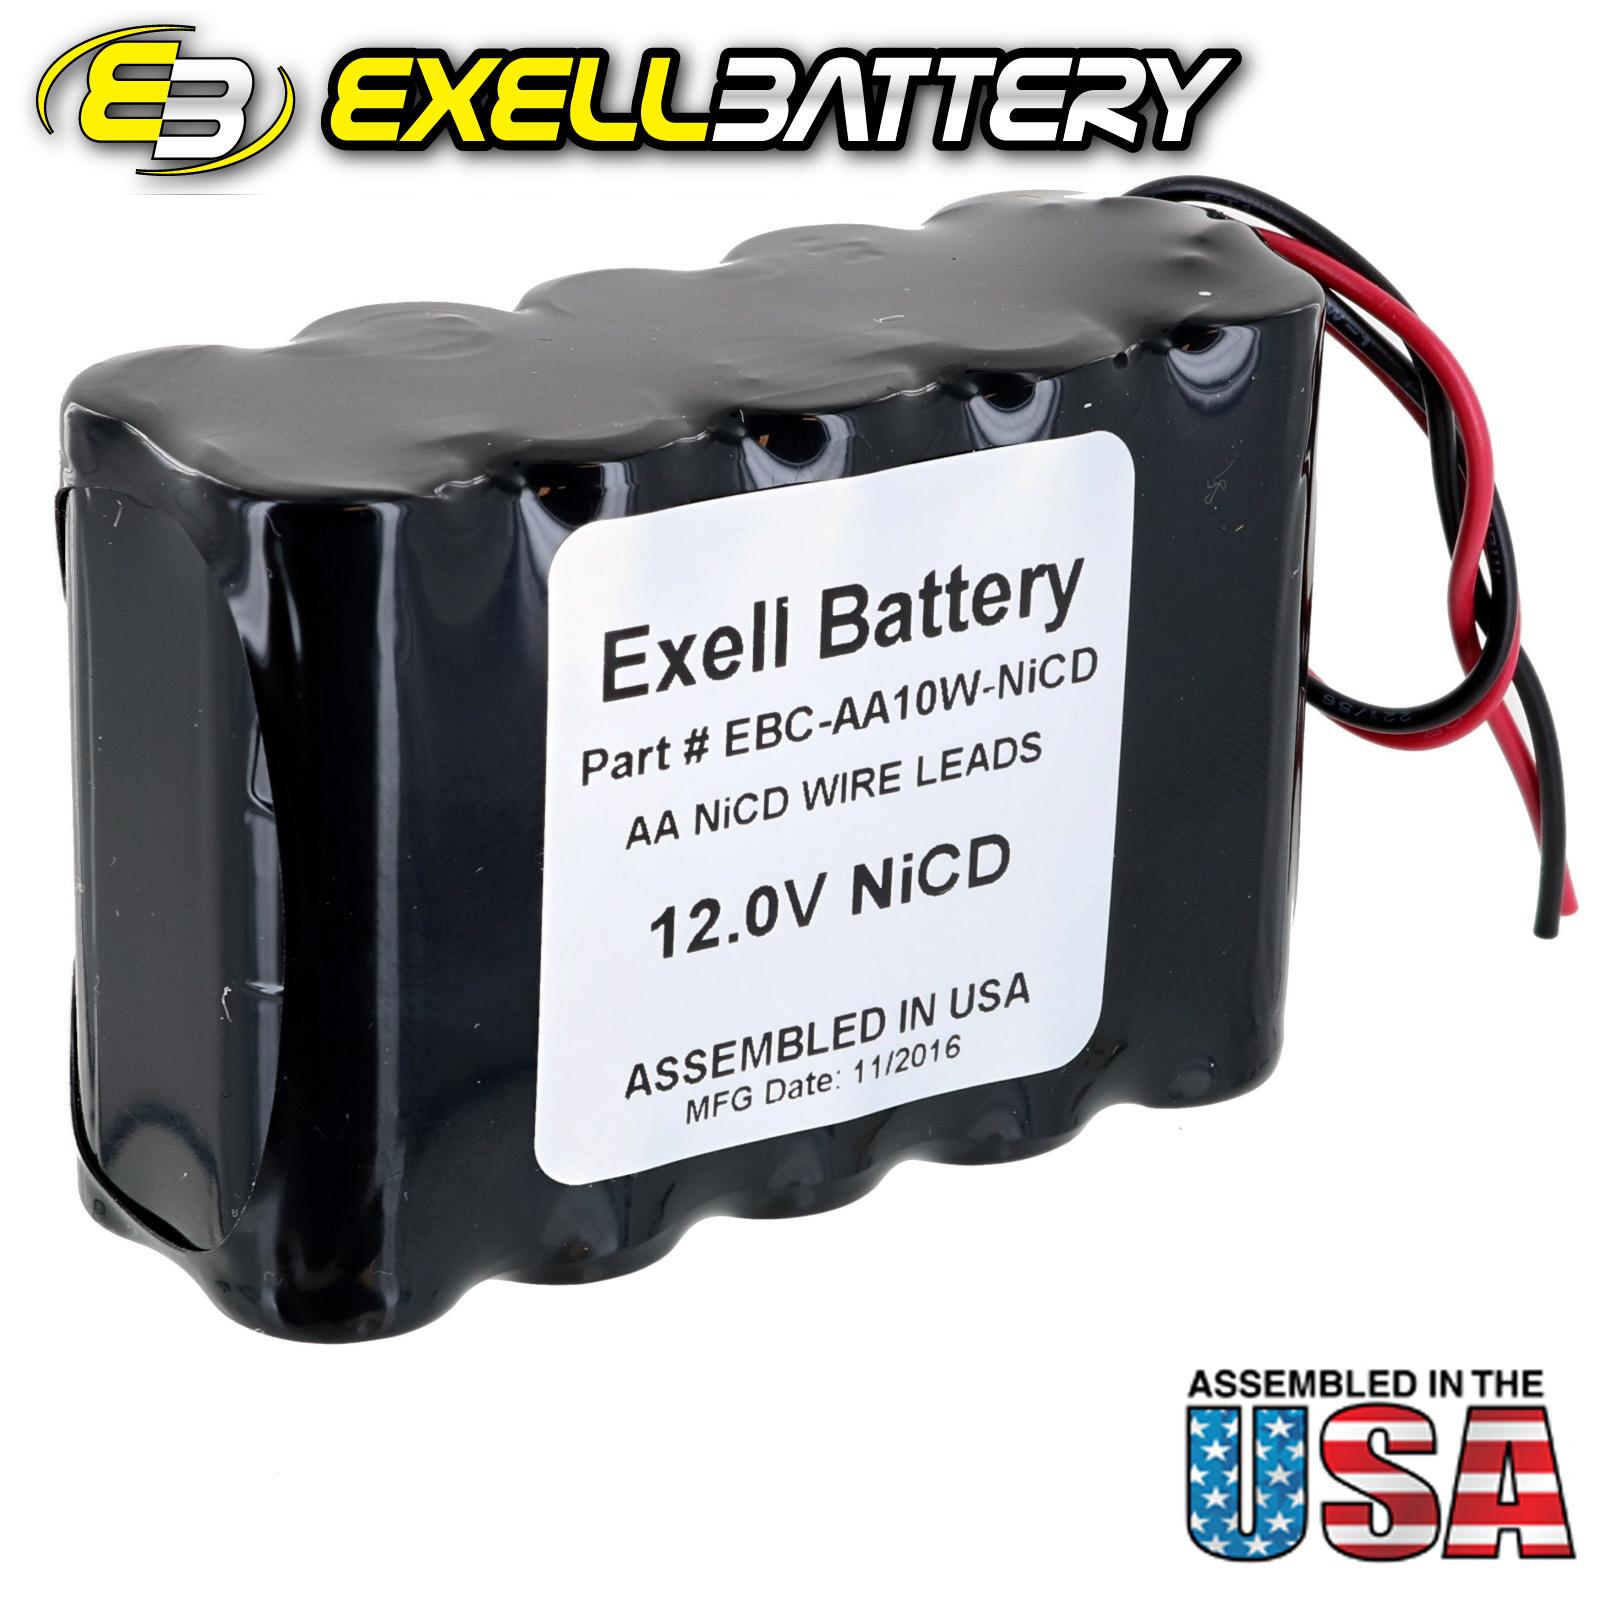 Exell 12V 1000mAh (10xAA) NiCd Battery Pack w/ Wire Leads | eBay